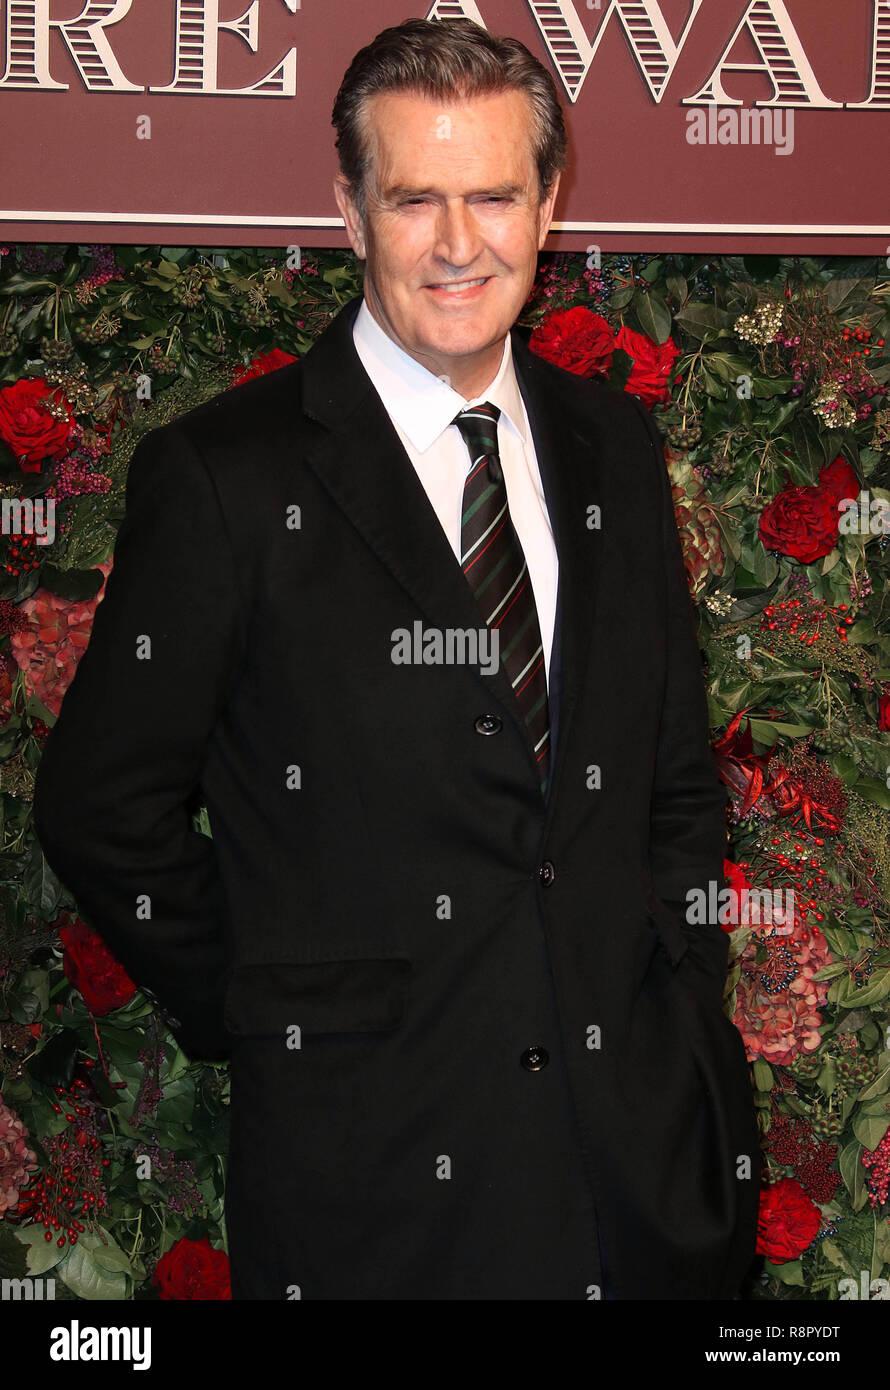 Nov 18, 2018  - attending 64th Evening Standard Theatre Awards, Theatre Royal Drury Lane in London, UK - Stock Image